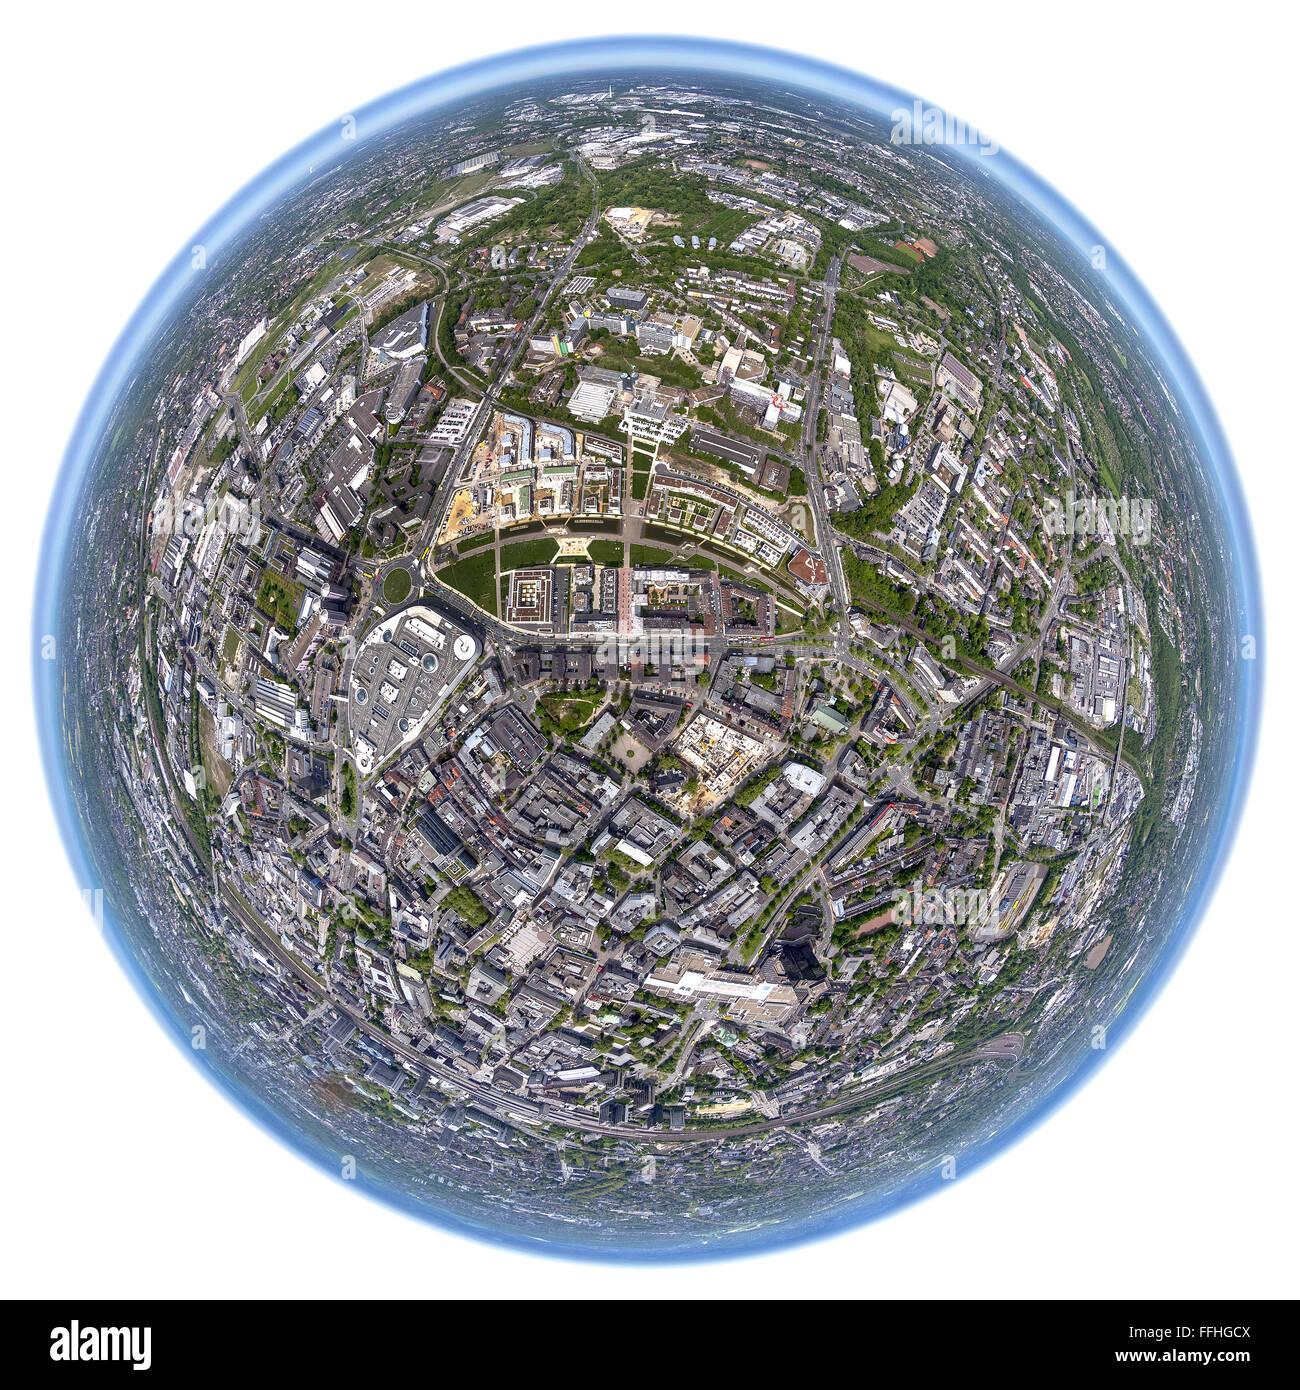 Aerial view, the university district Essen, city center, Green Centre Essen, fisheye image, Essen center, Globe - Stock Image